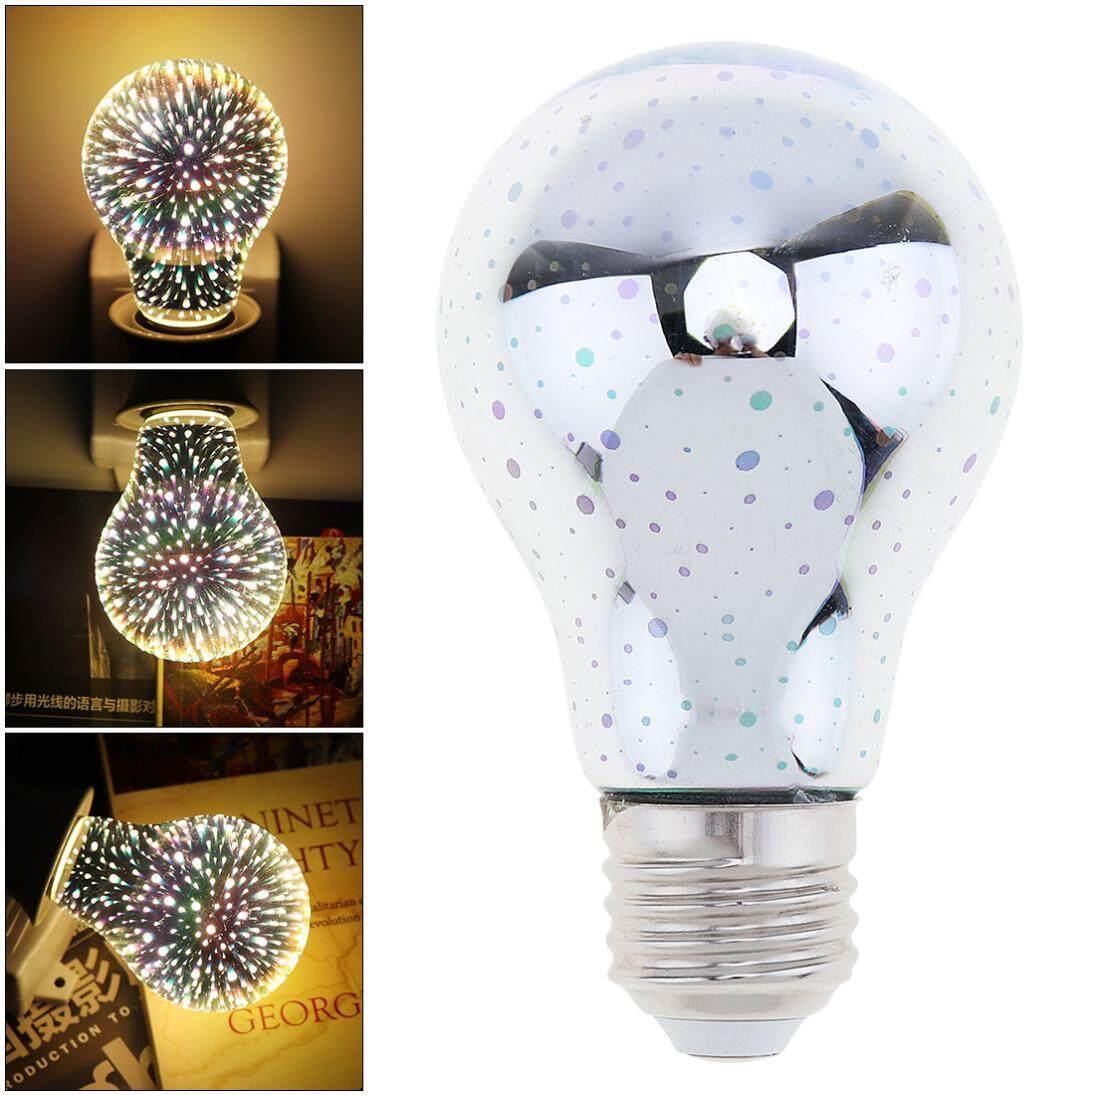 360 Degree Luminescence Angle A60 E27 AC 85-265V 3W Dazzle Color Led Light Bulb 3D Decoration Fireworks Bulb for Christmas / Holiday / Interior Decoration - intl